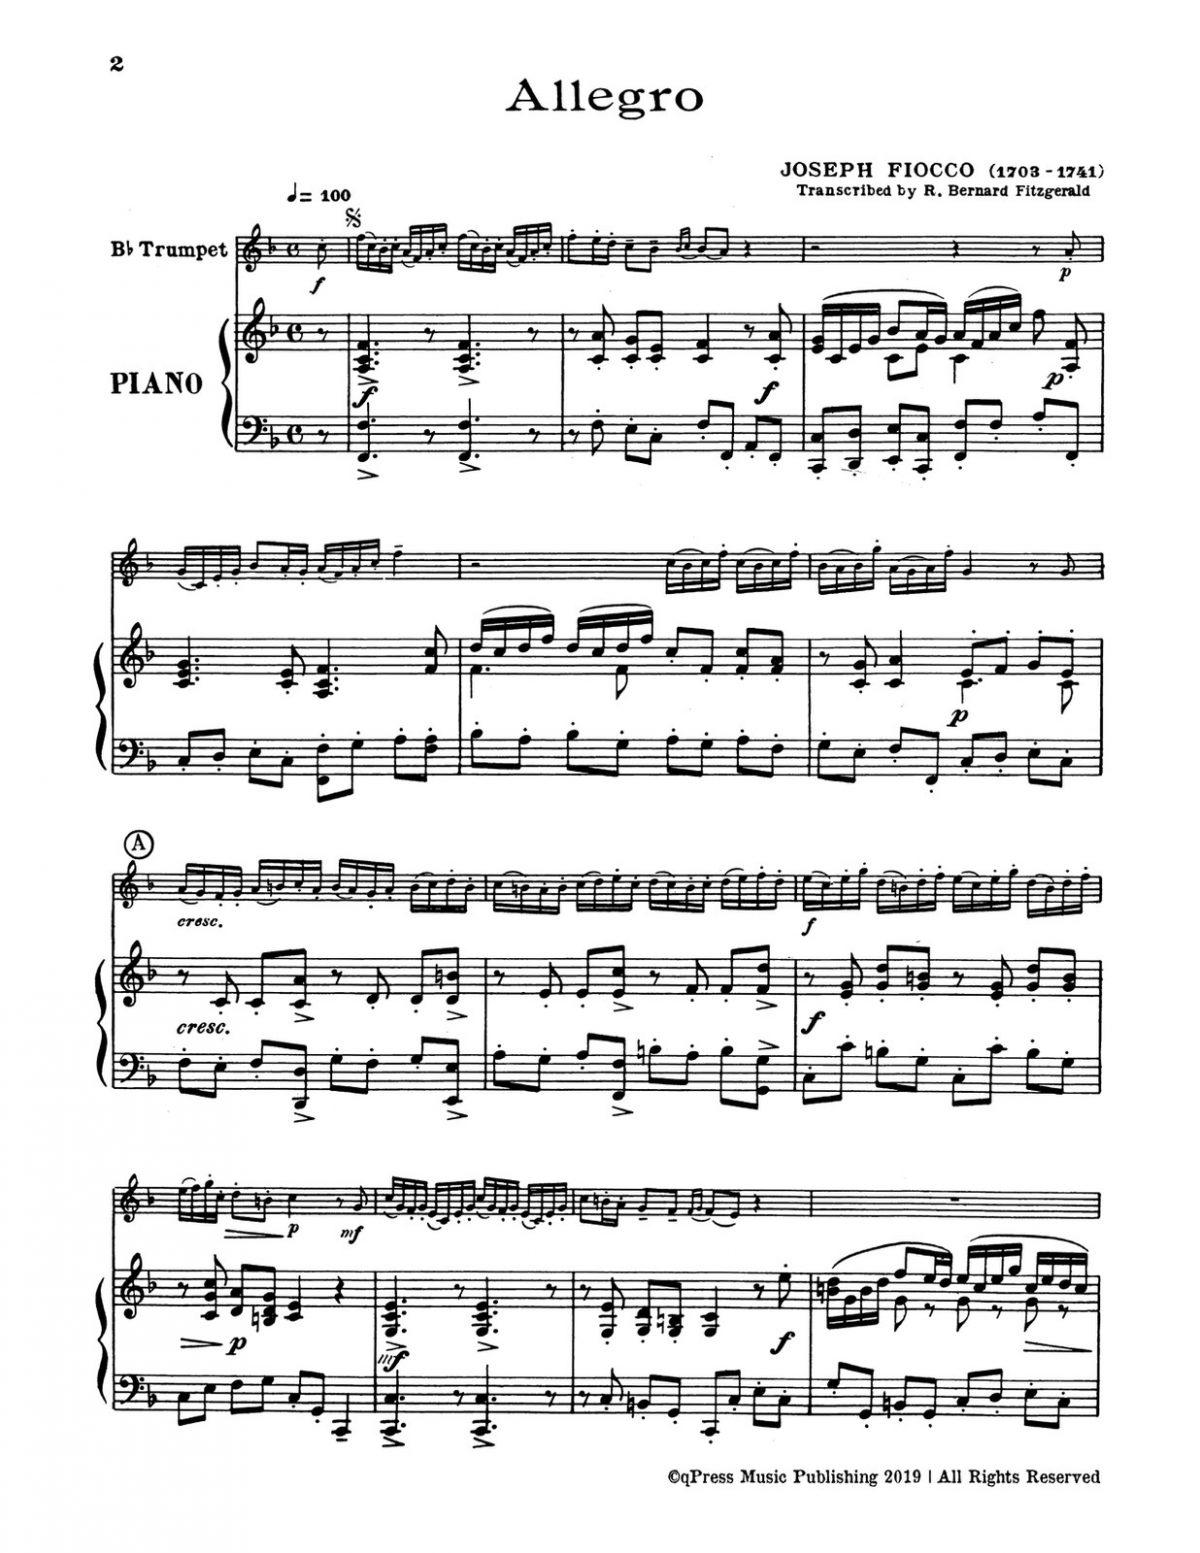 Fiocco, Allegro for Bb Trumpet and Piano-p3